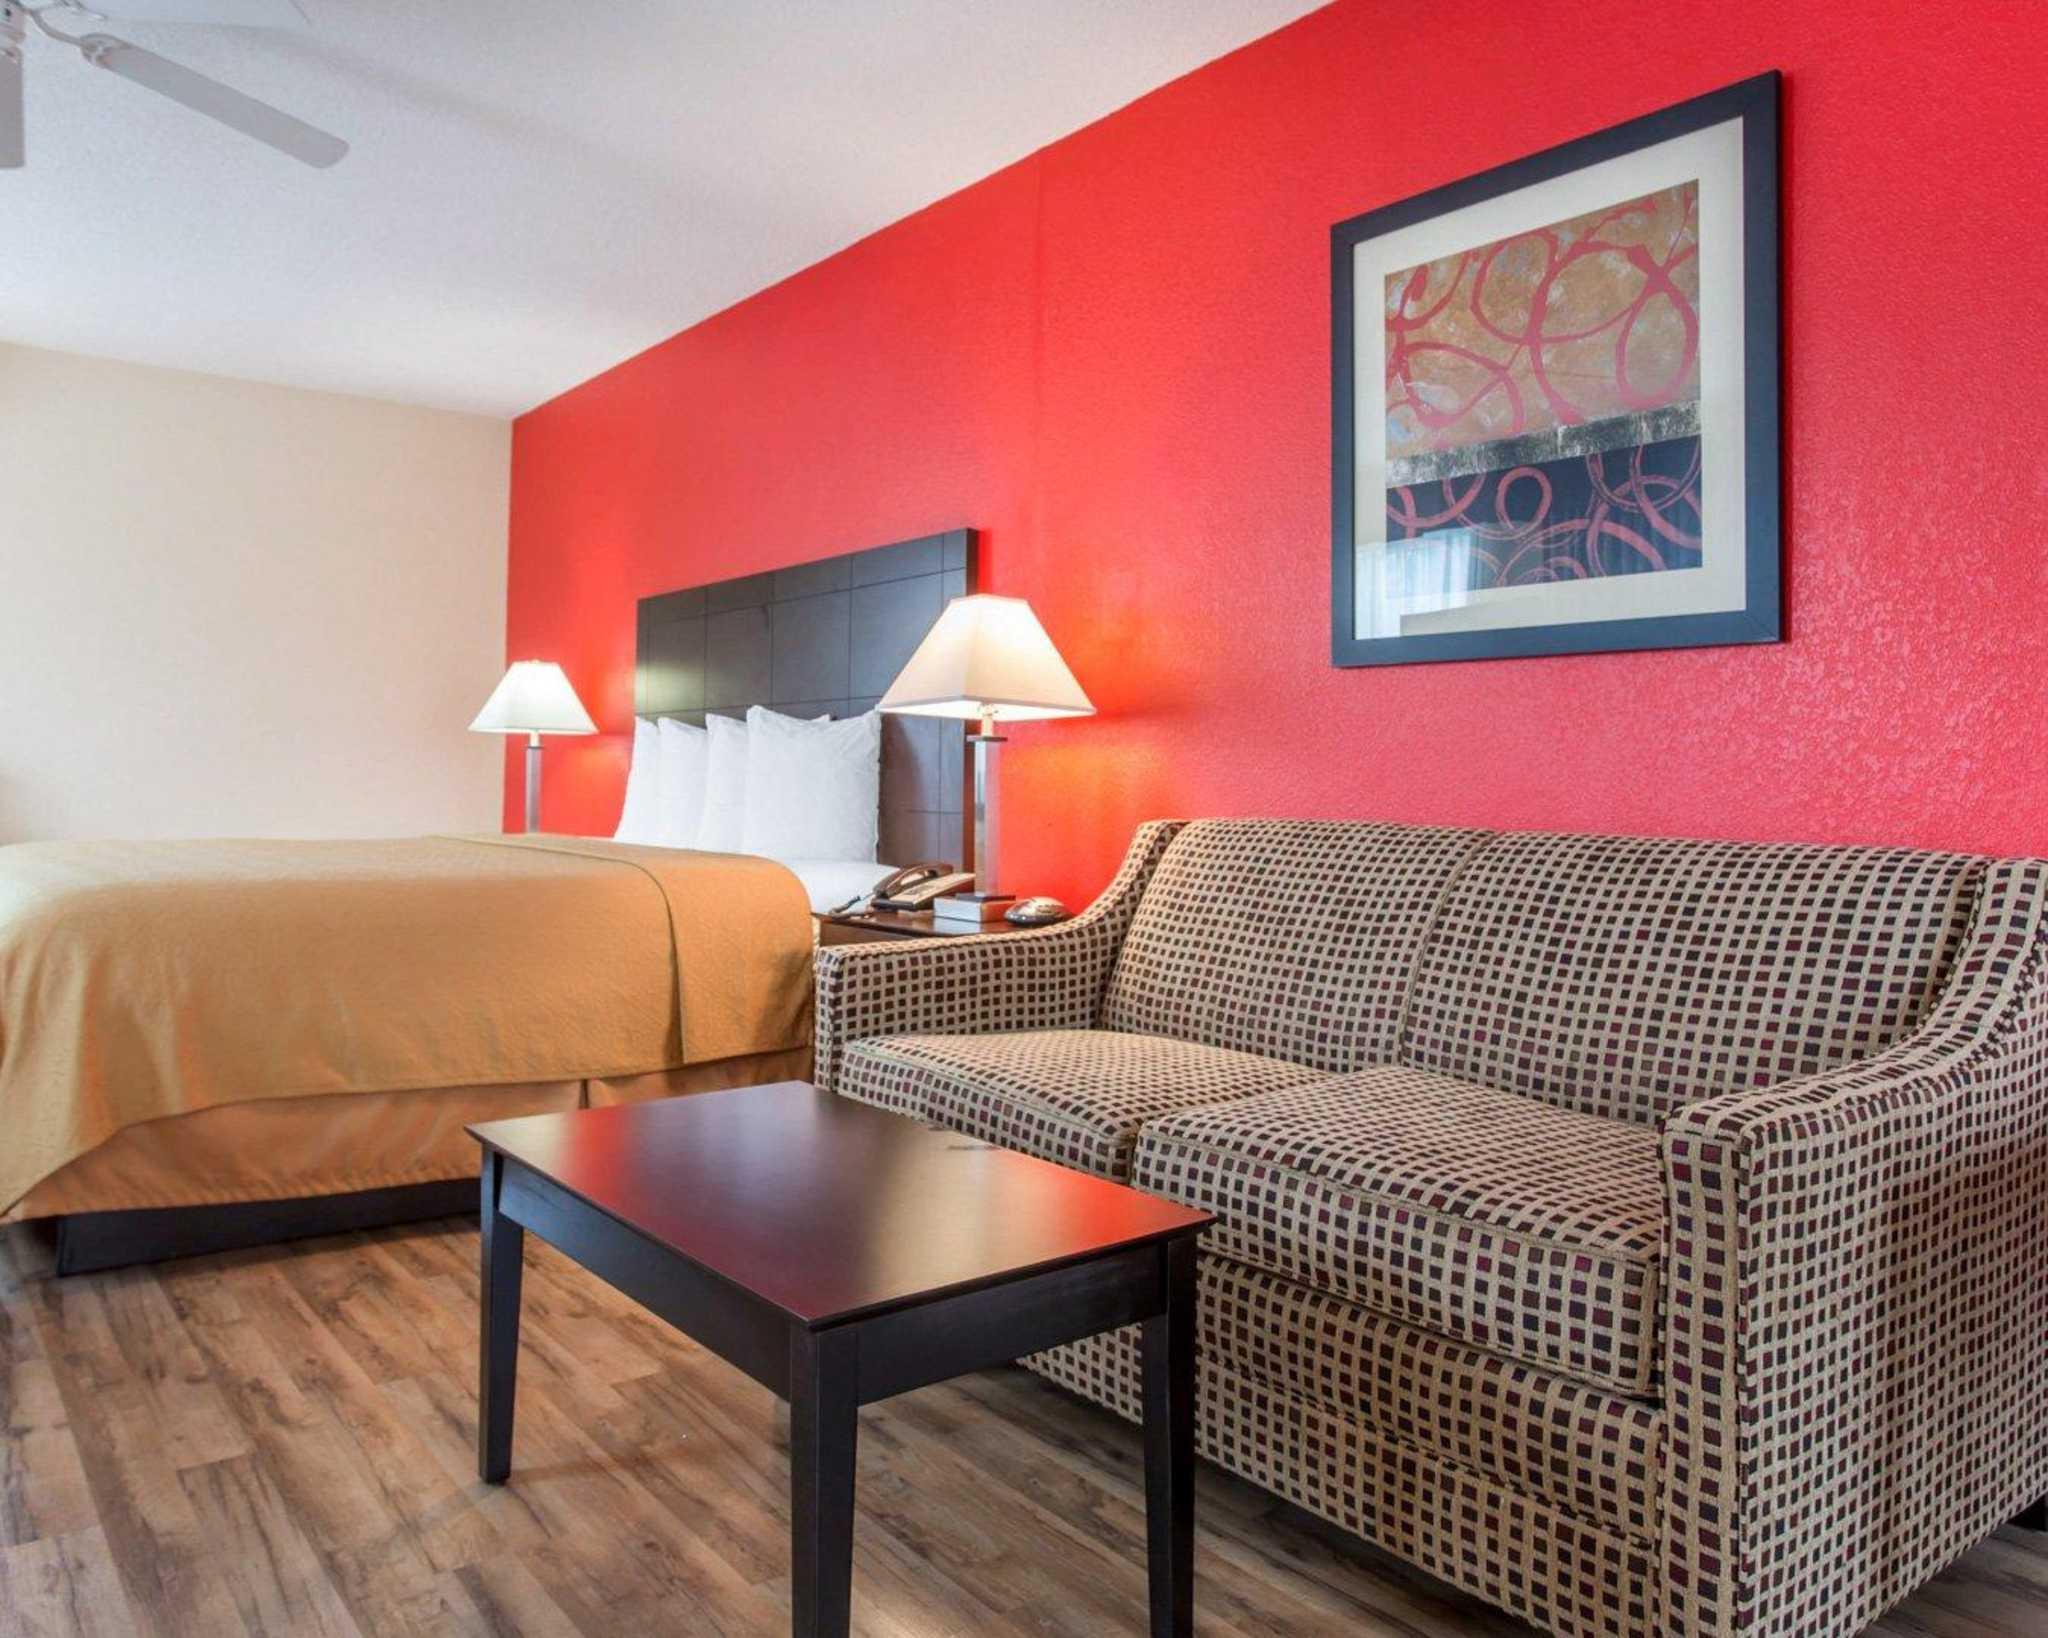 Quality Inn & Suites image 32